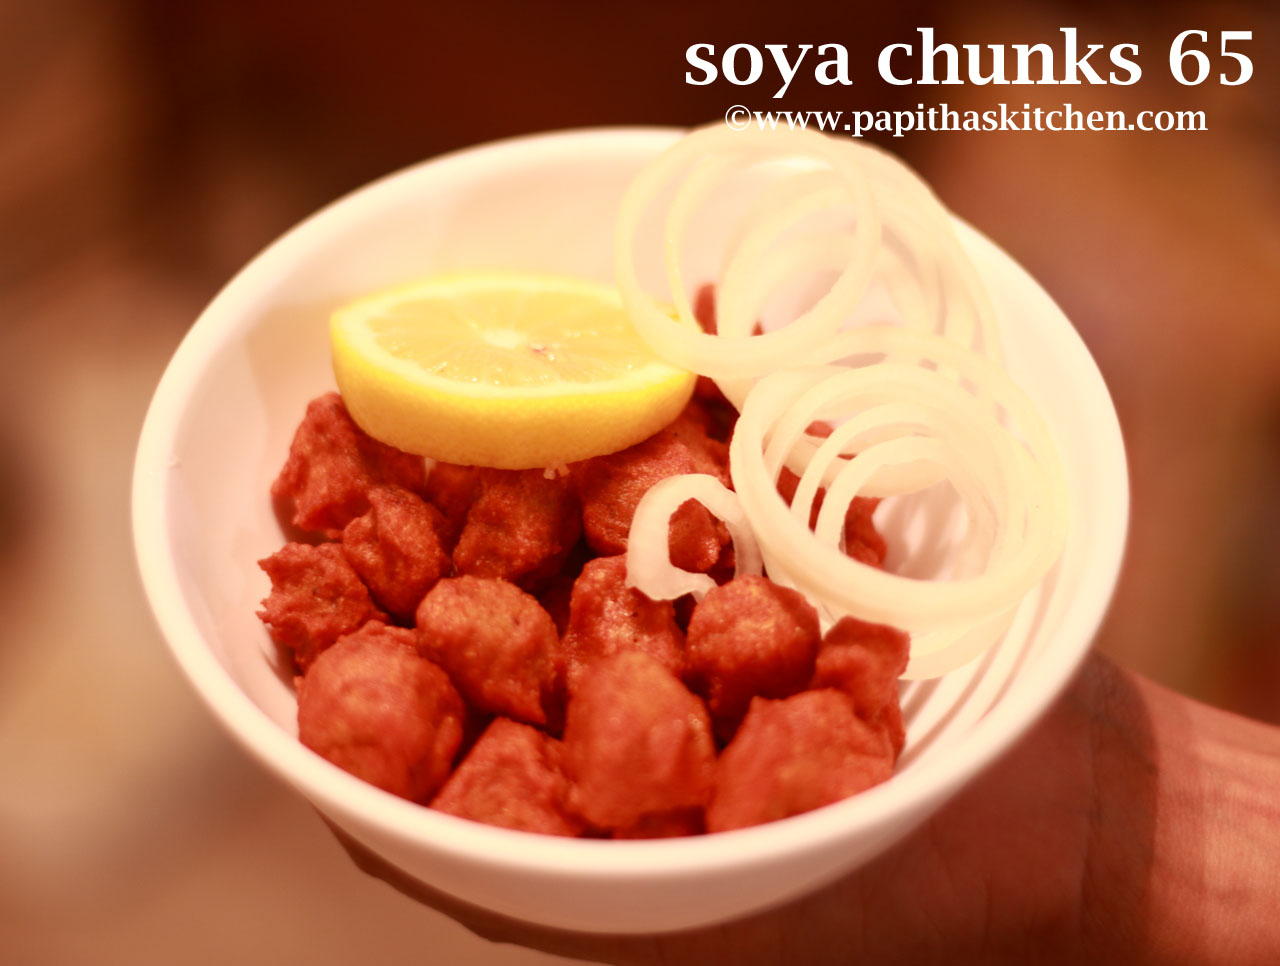 soya chunks 65